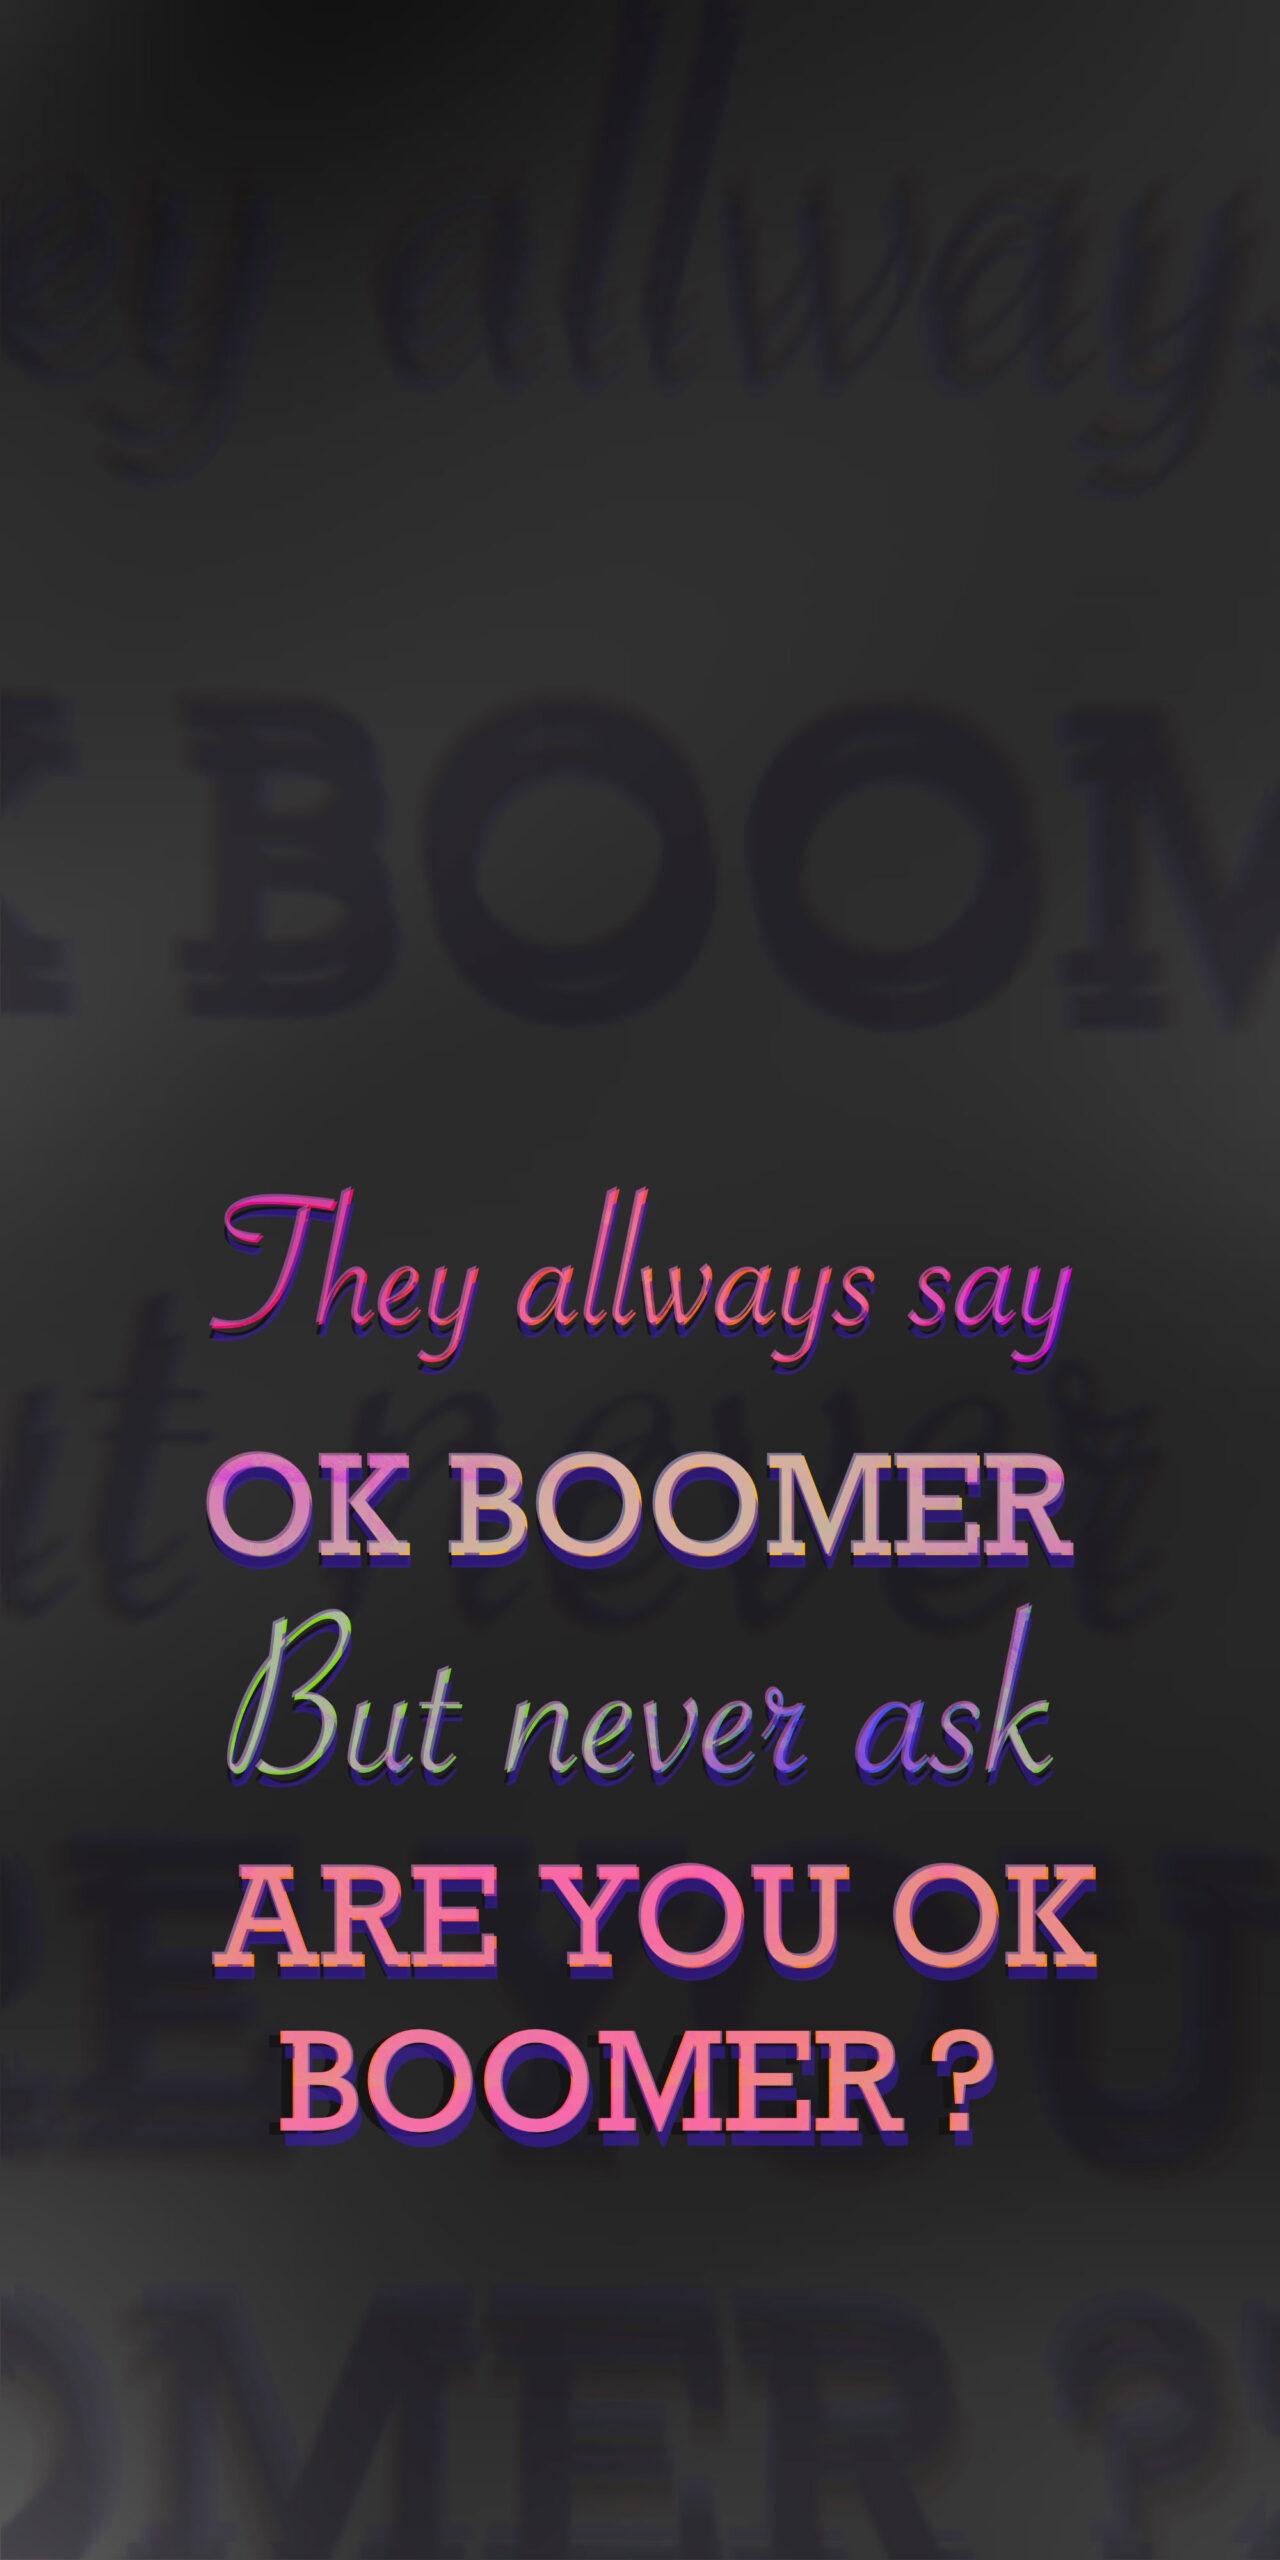 are you ok boomer black wallpaper